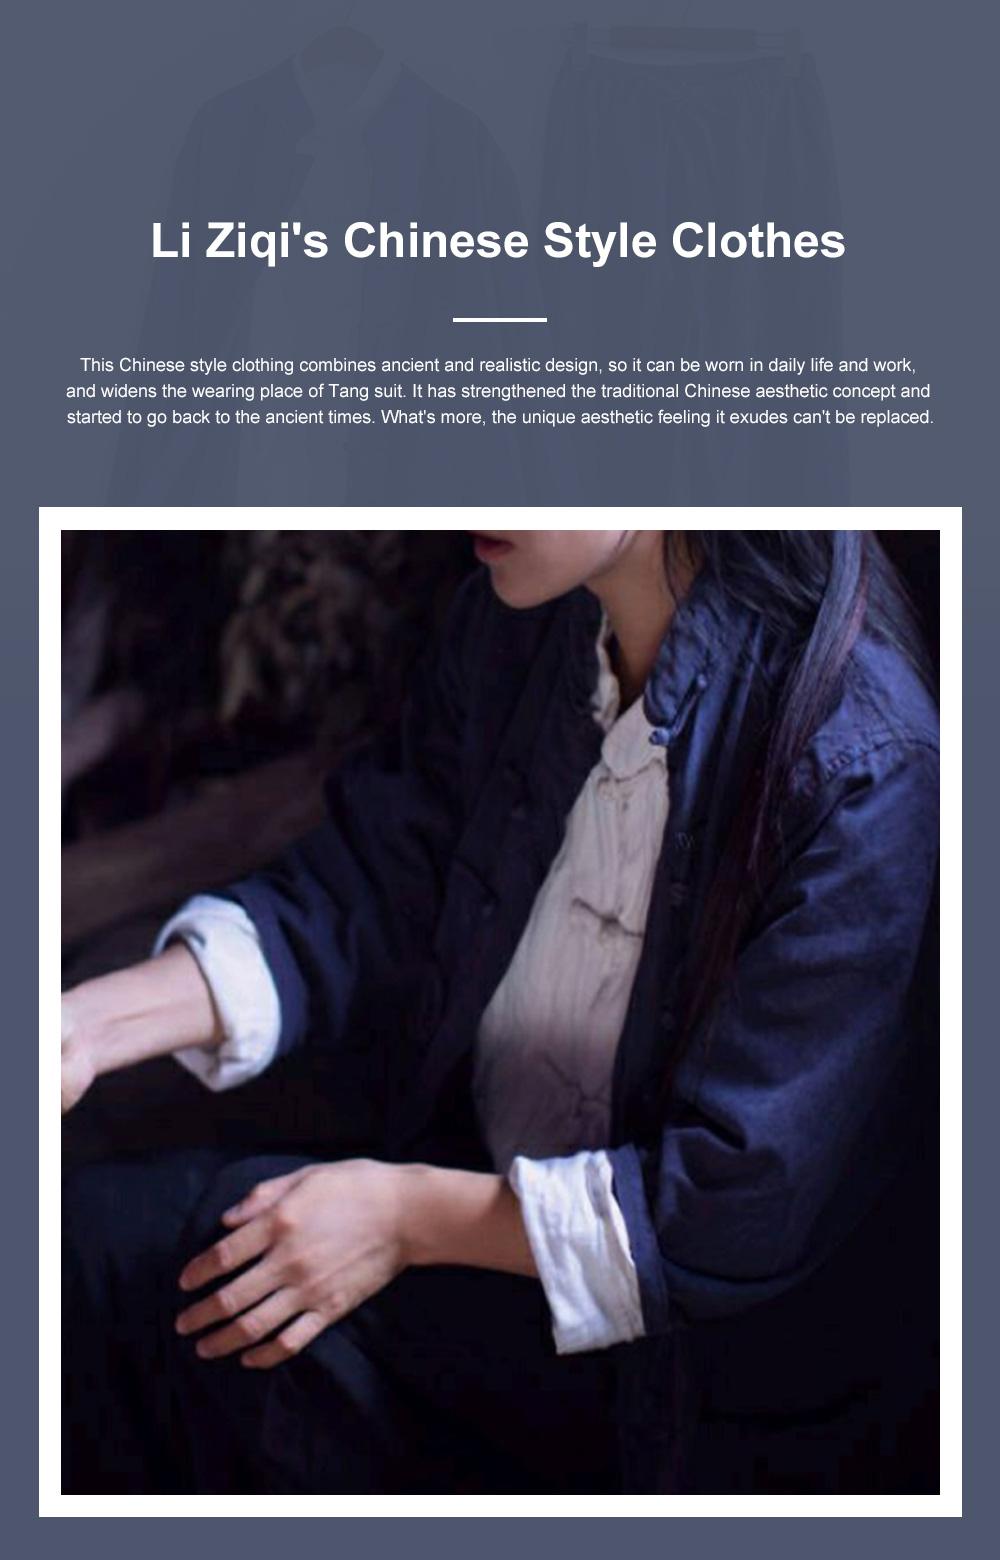 Li Ziqi's Chinese Style Clothes Retro Han Suit Chinese Ancient Style Cotton Hemp Three Piece Suit Reclusive Clothes Meditation Clothes 0